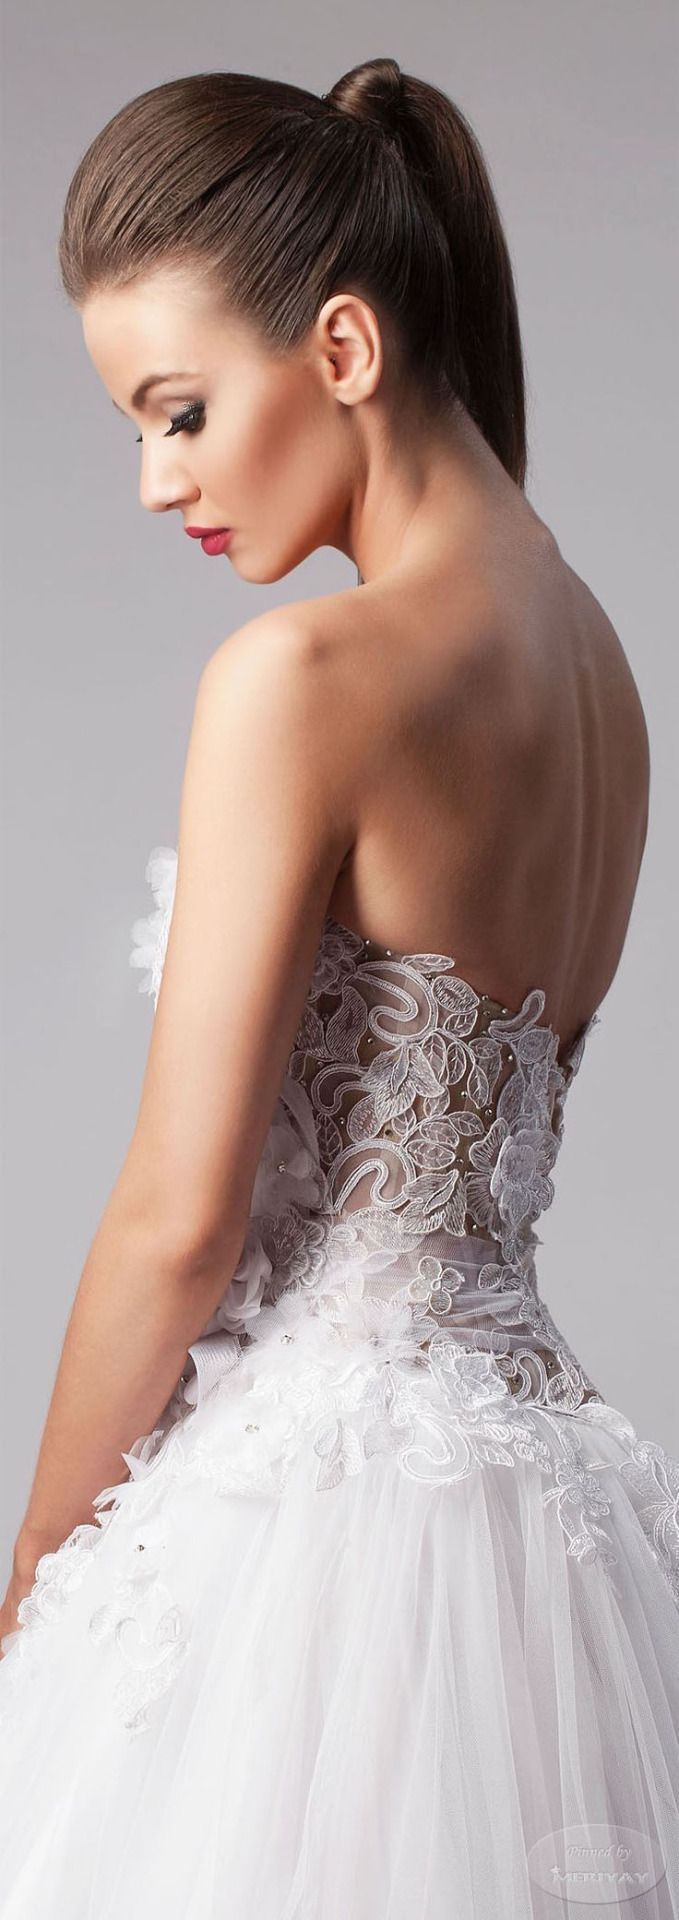 Elite wedding dresses   best The Princess  Parlor images on Pinterest  Bridal